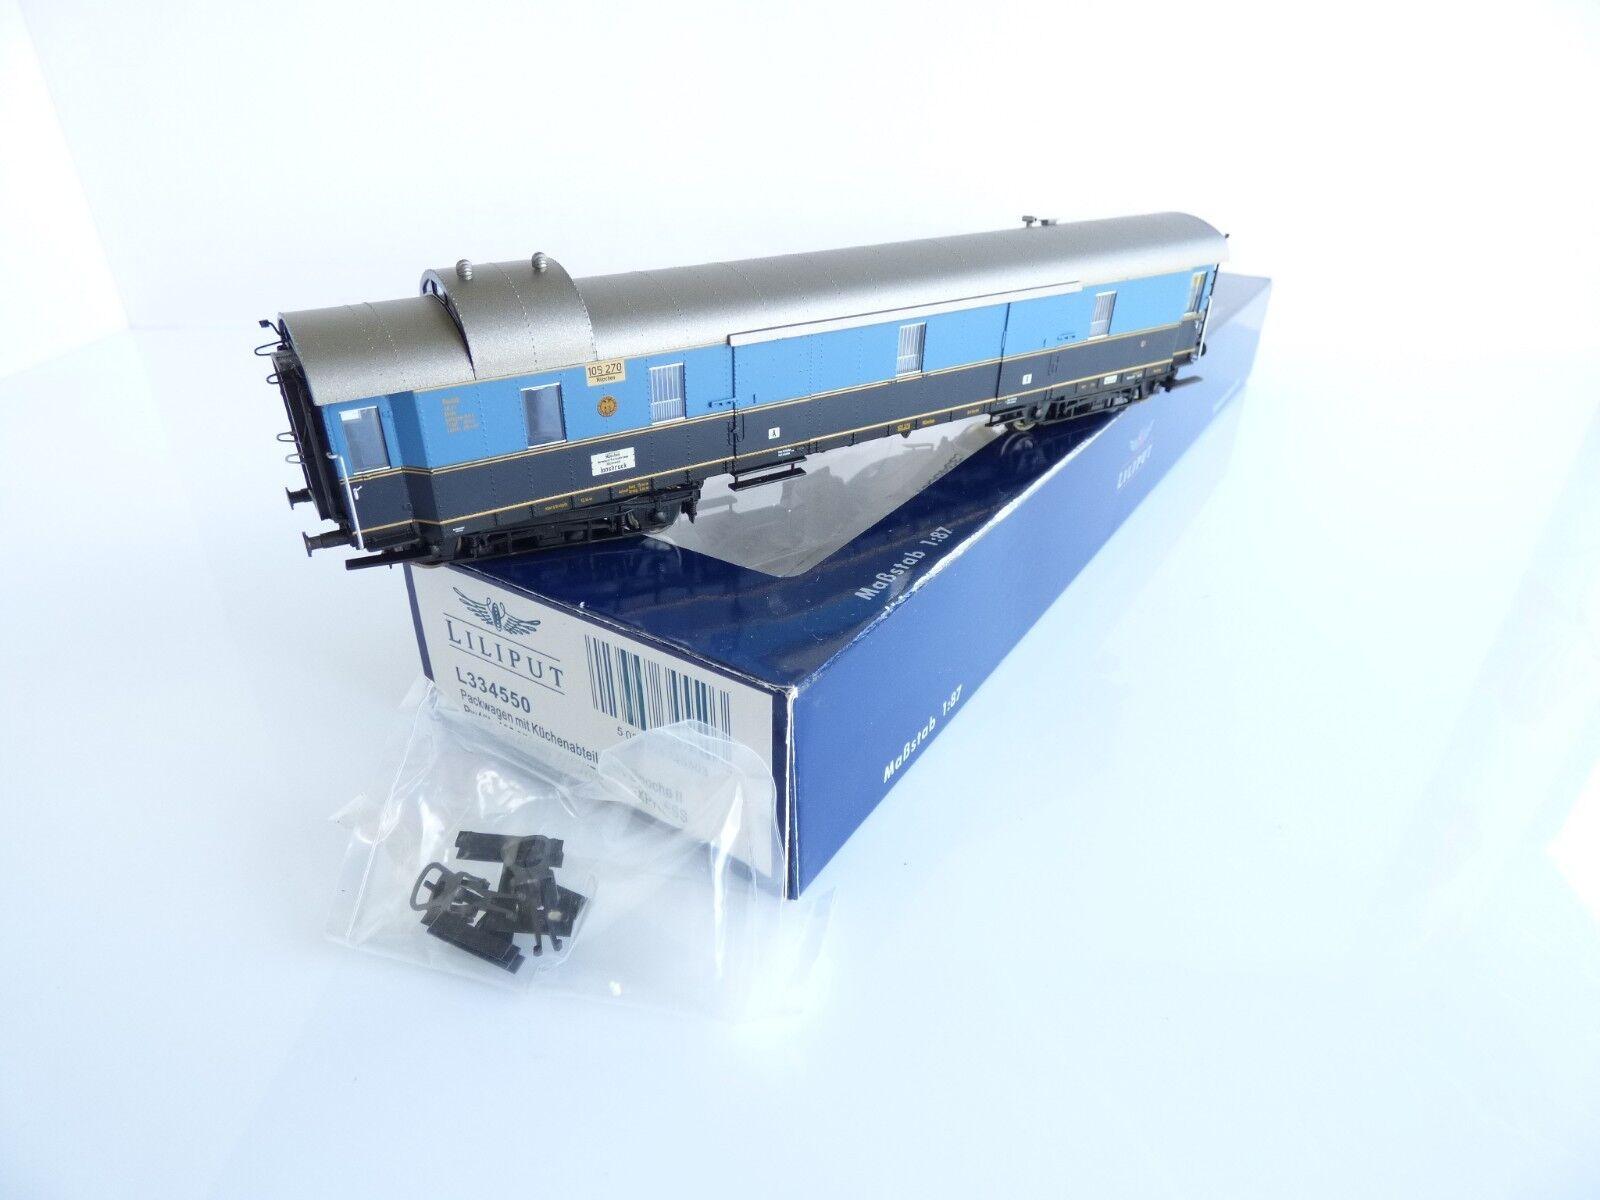 Liliput l334550 baggage car has the DRG pw4ük no 105 270 karwendel express